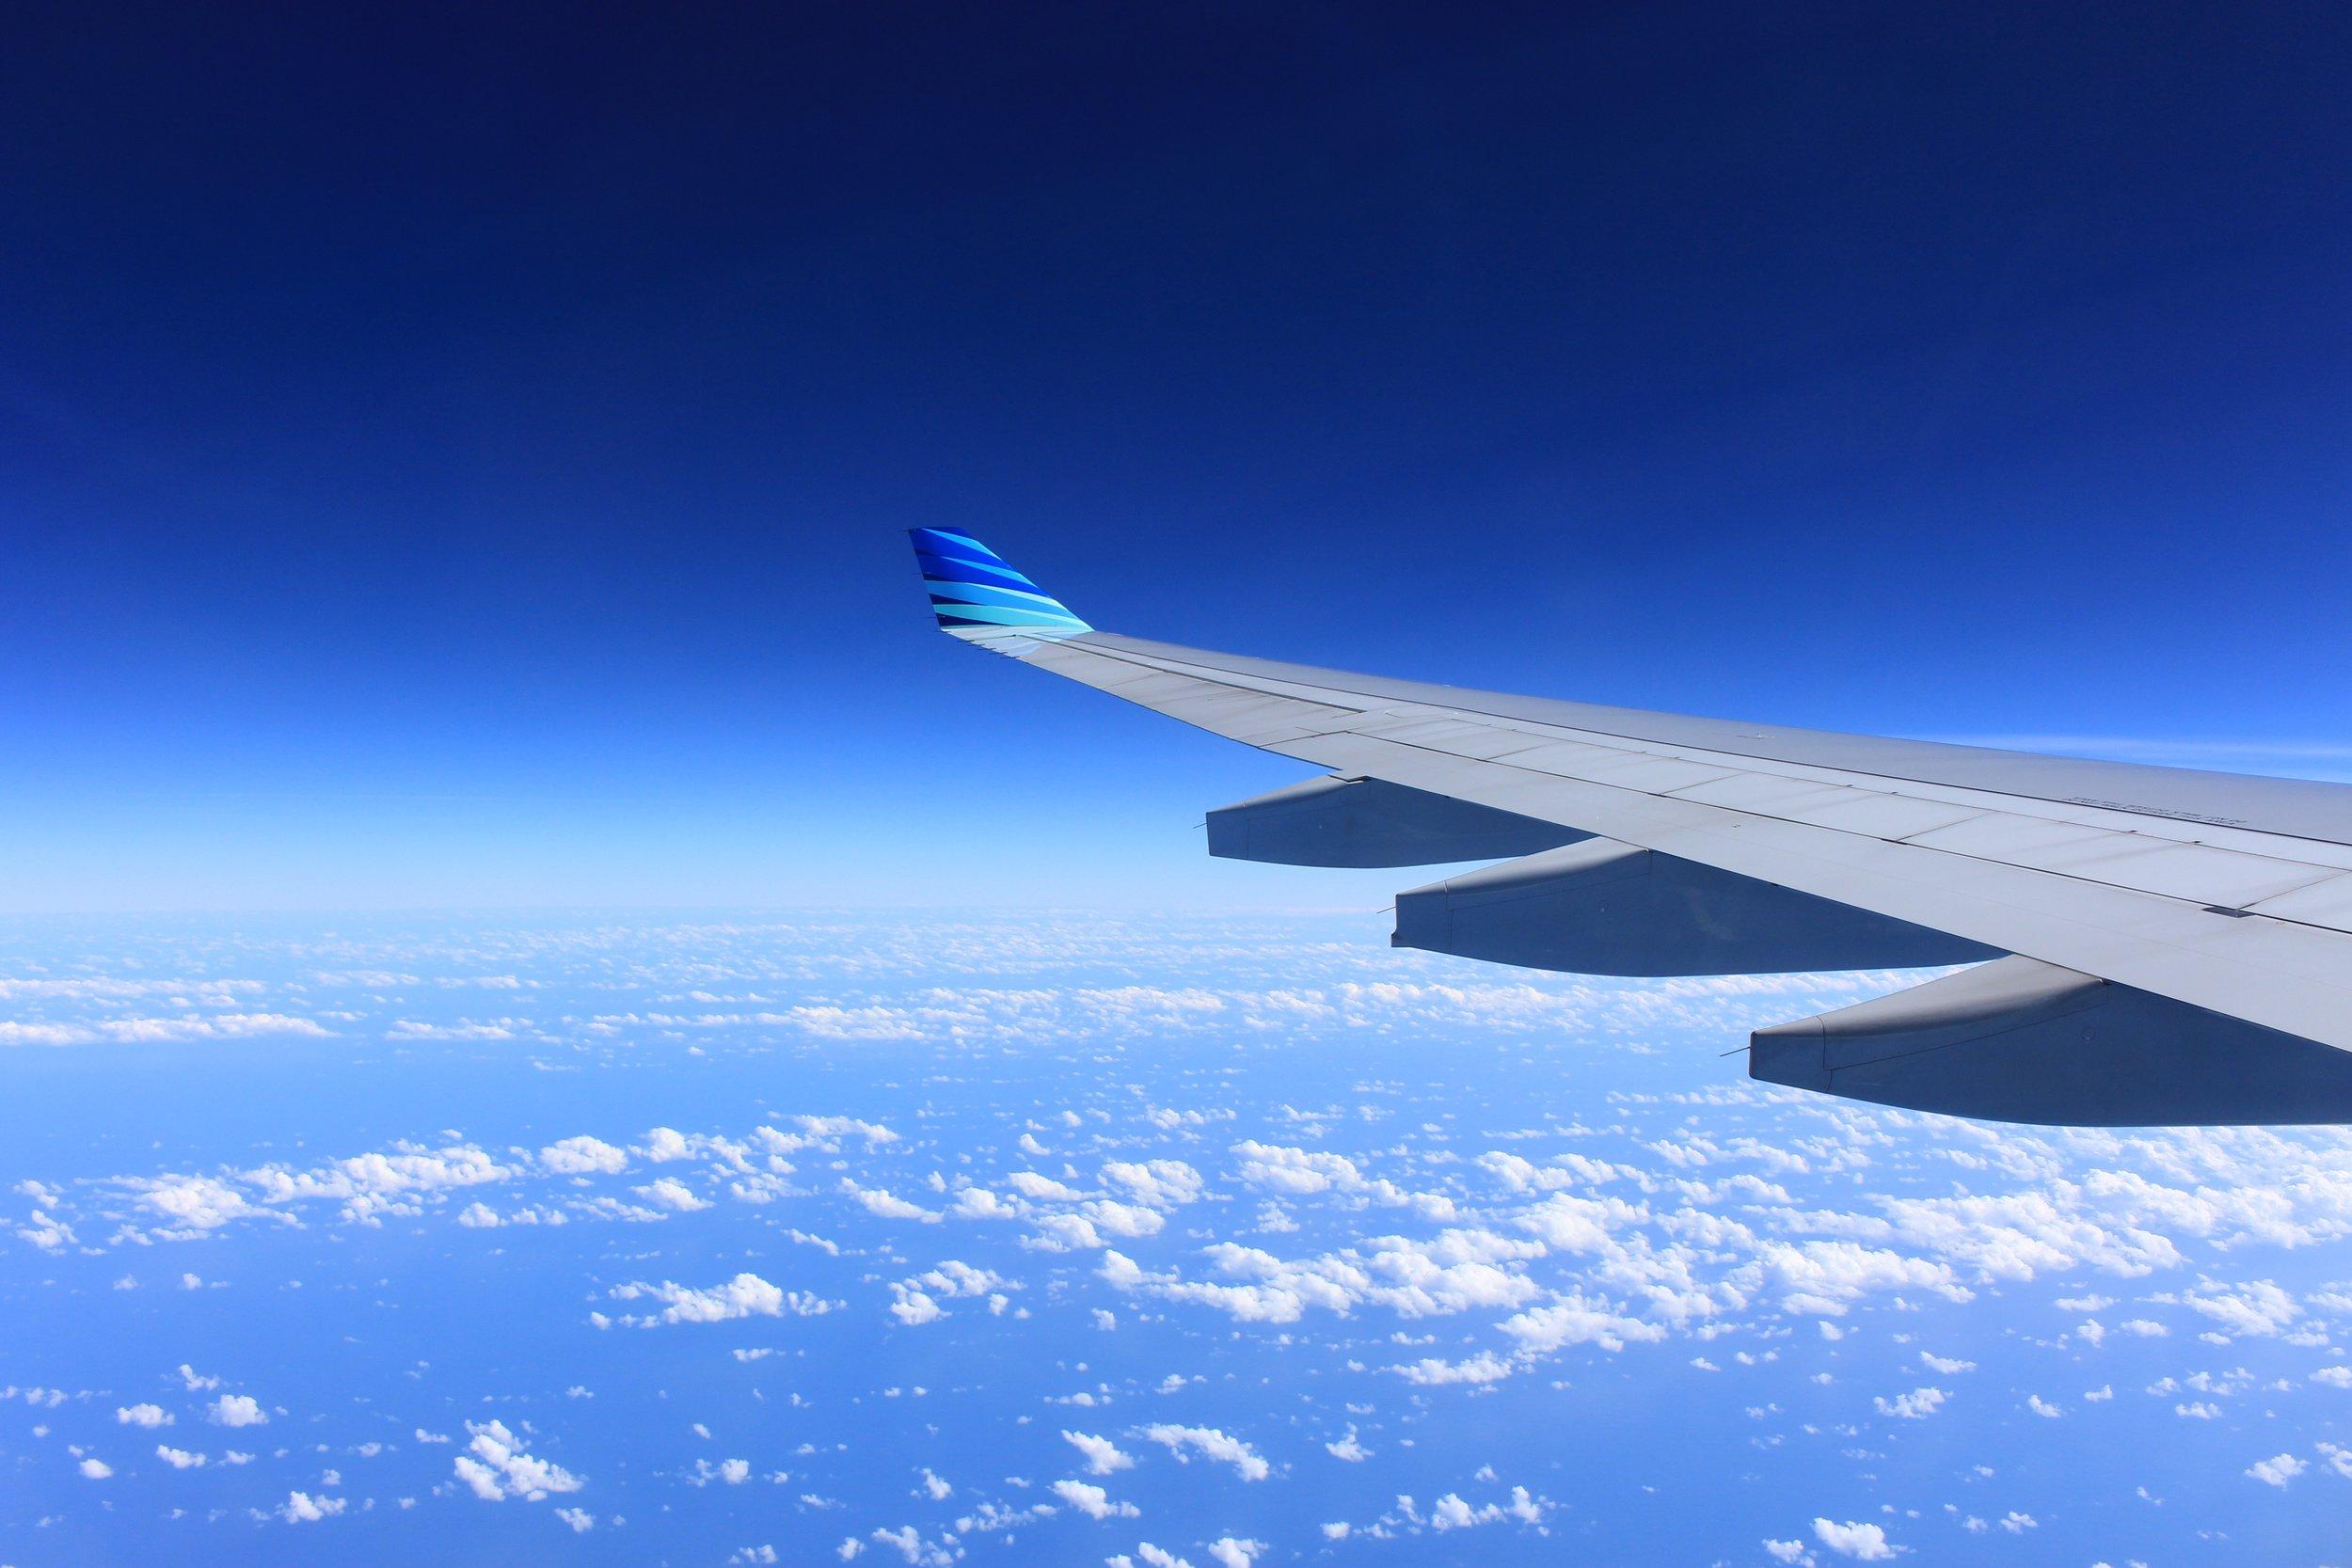 Aeroplane wing view